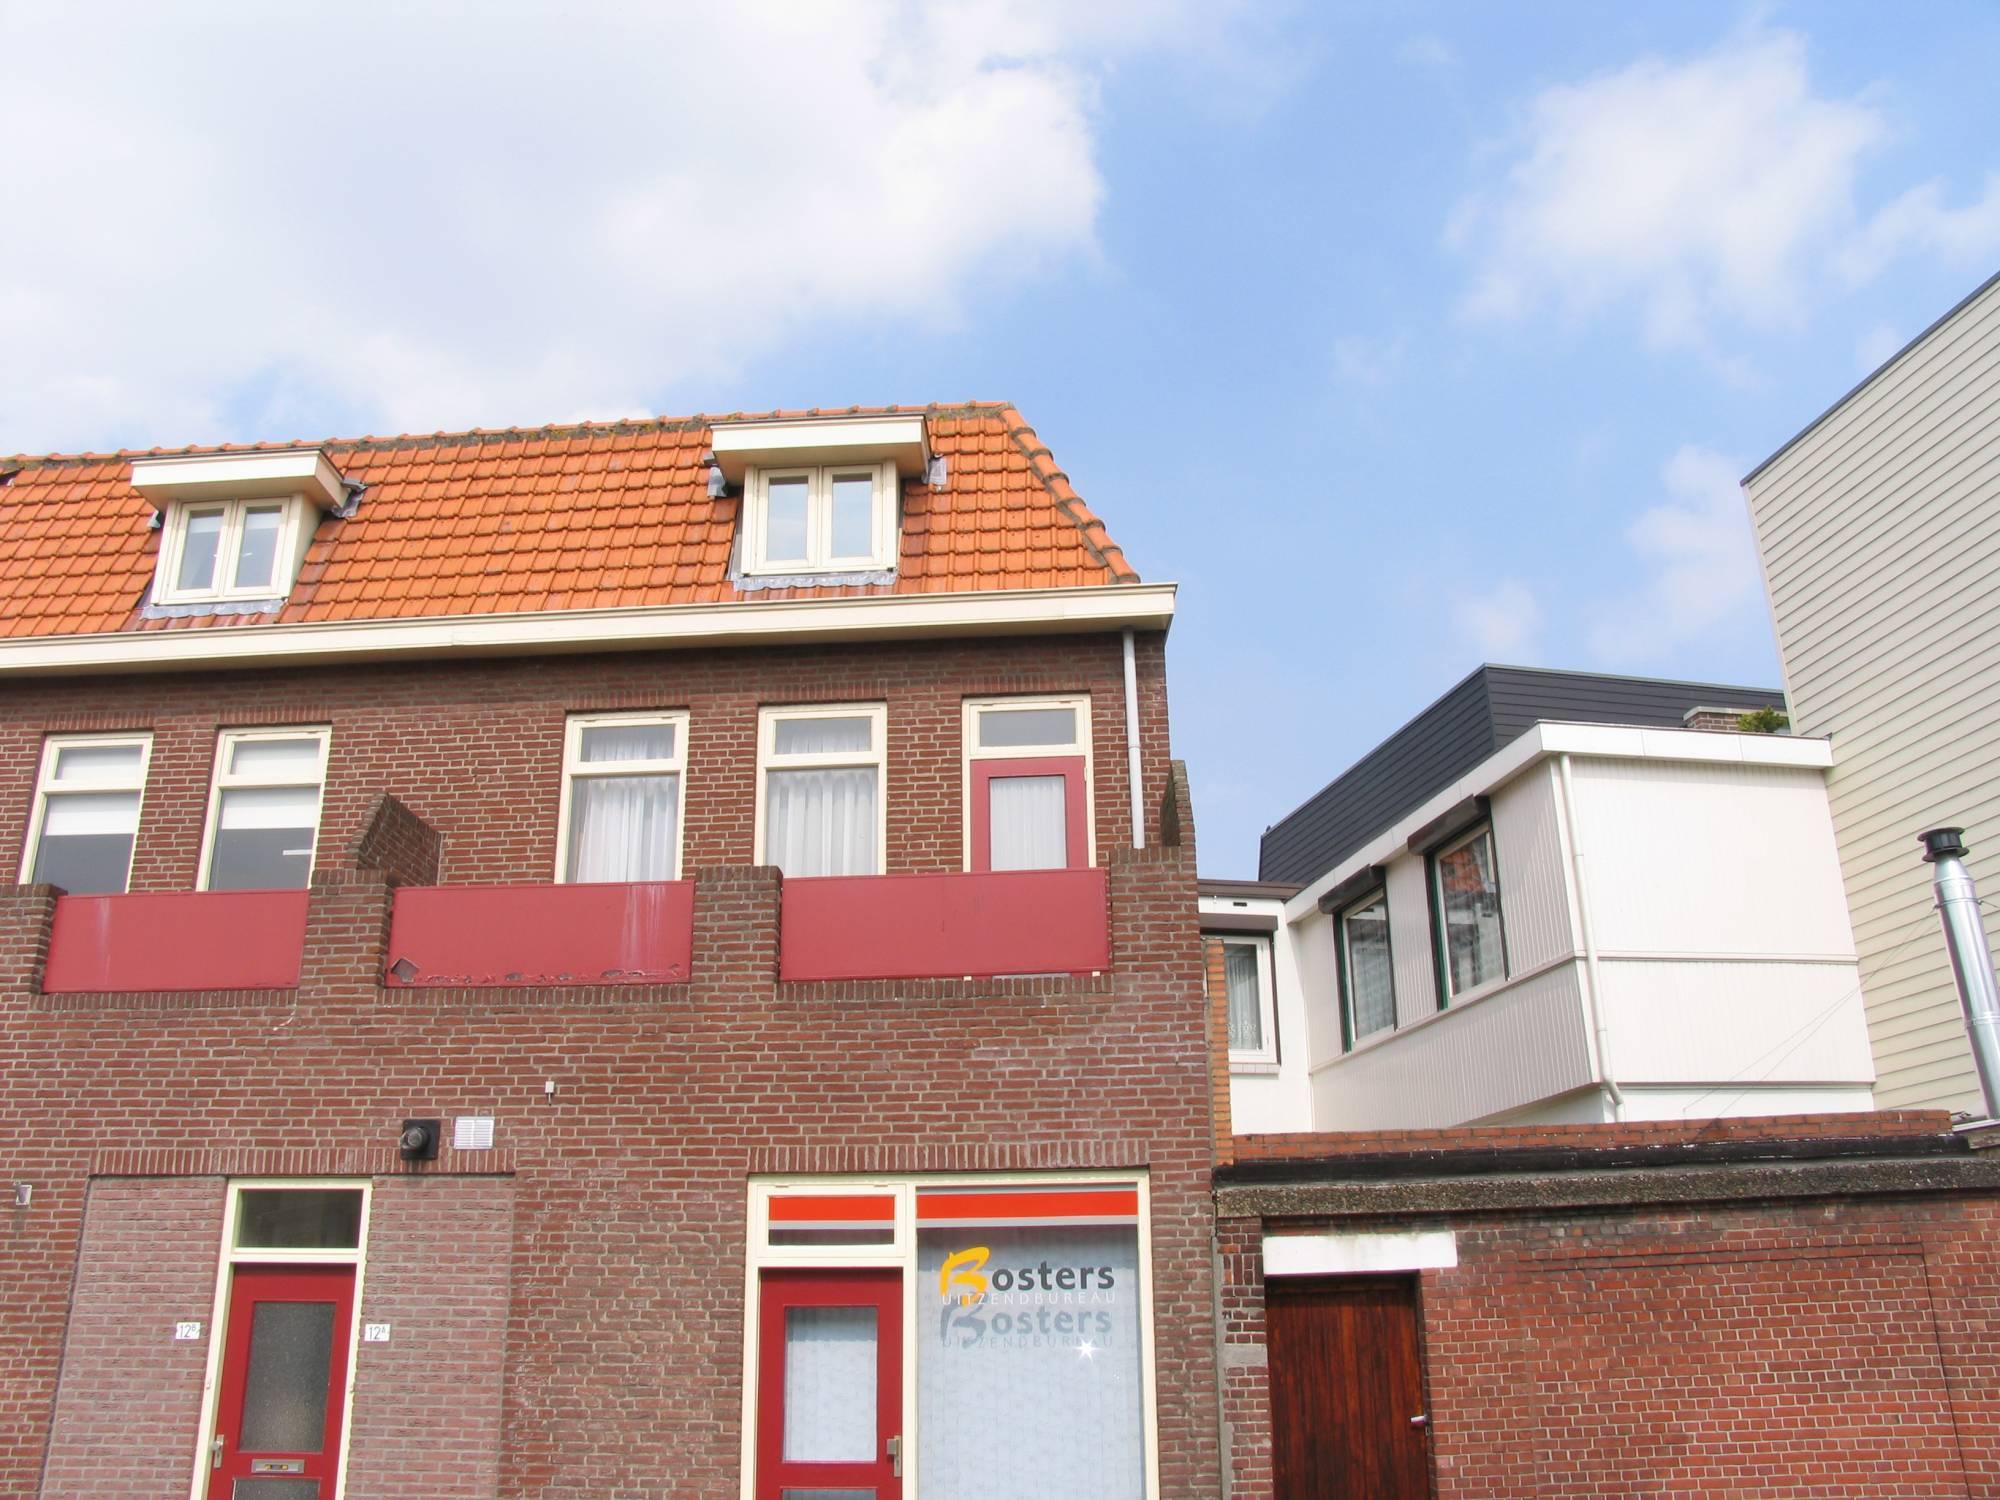 https://public.parariusoffice.nl/170/photos/huge/2850875.1426516377-525.jpg